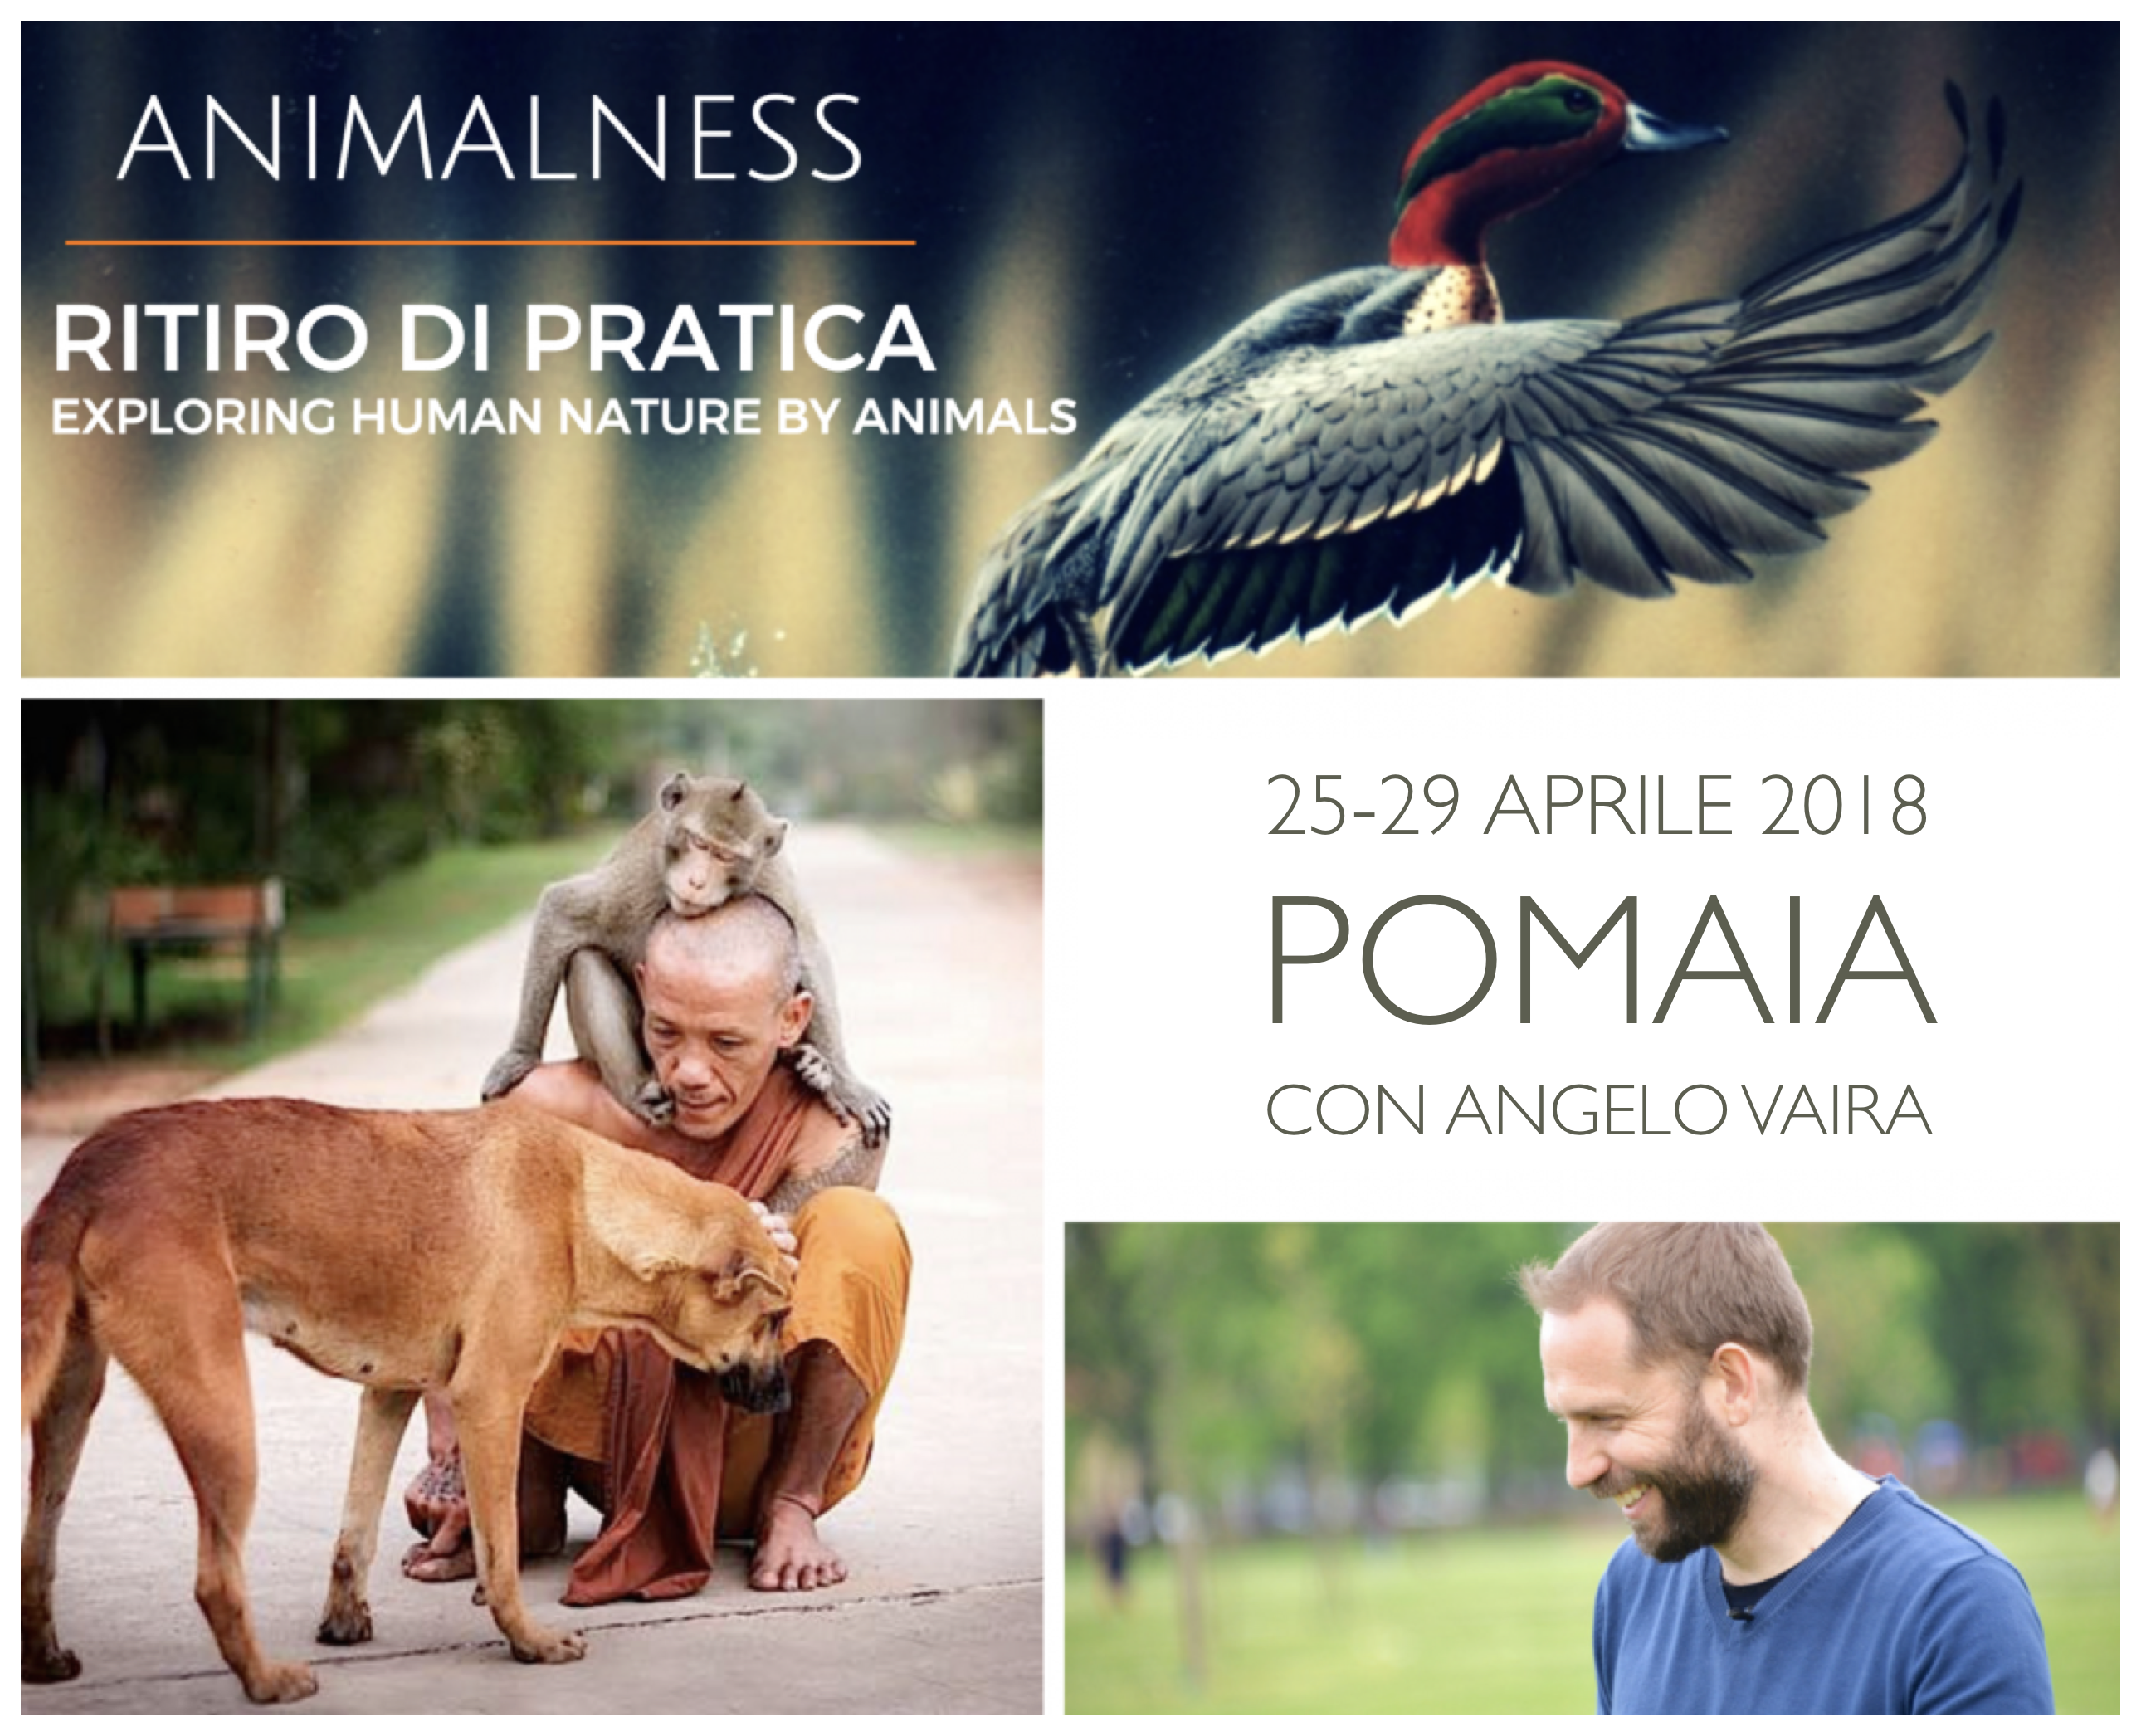 Ritiro Animalness con Angelo Vaira a Pomaia